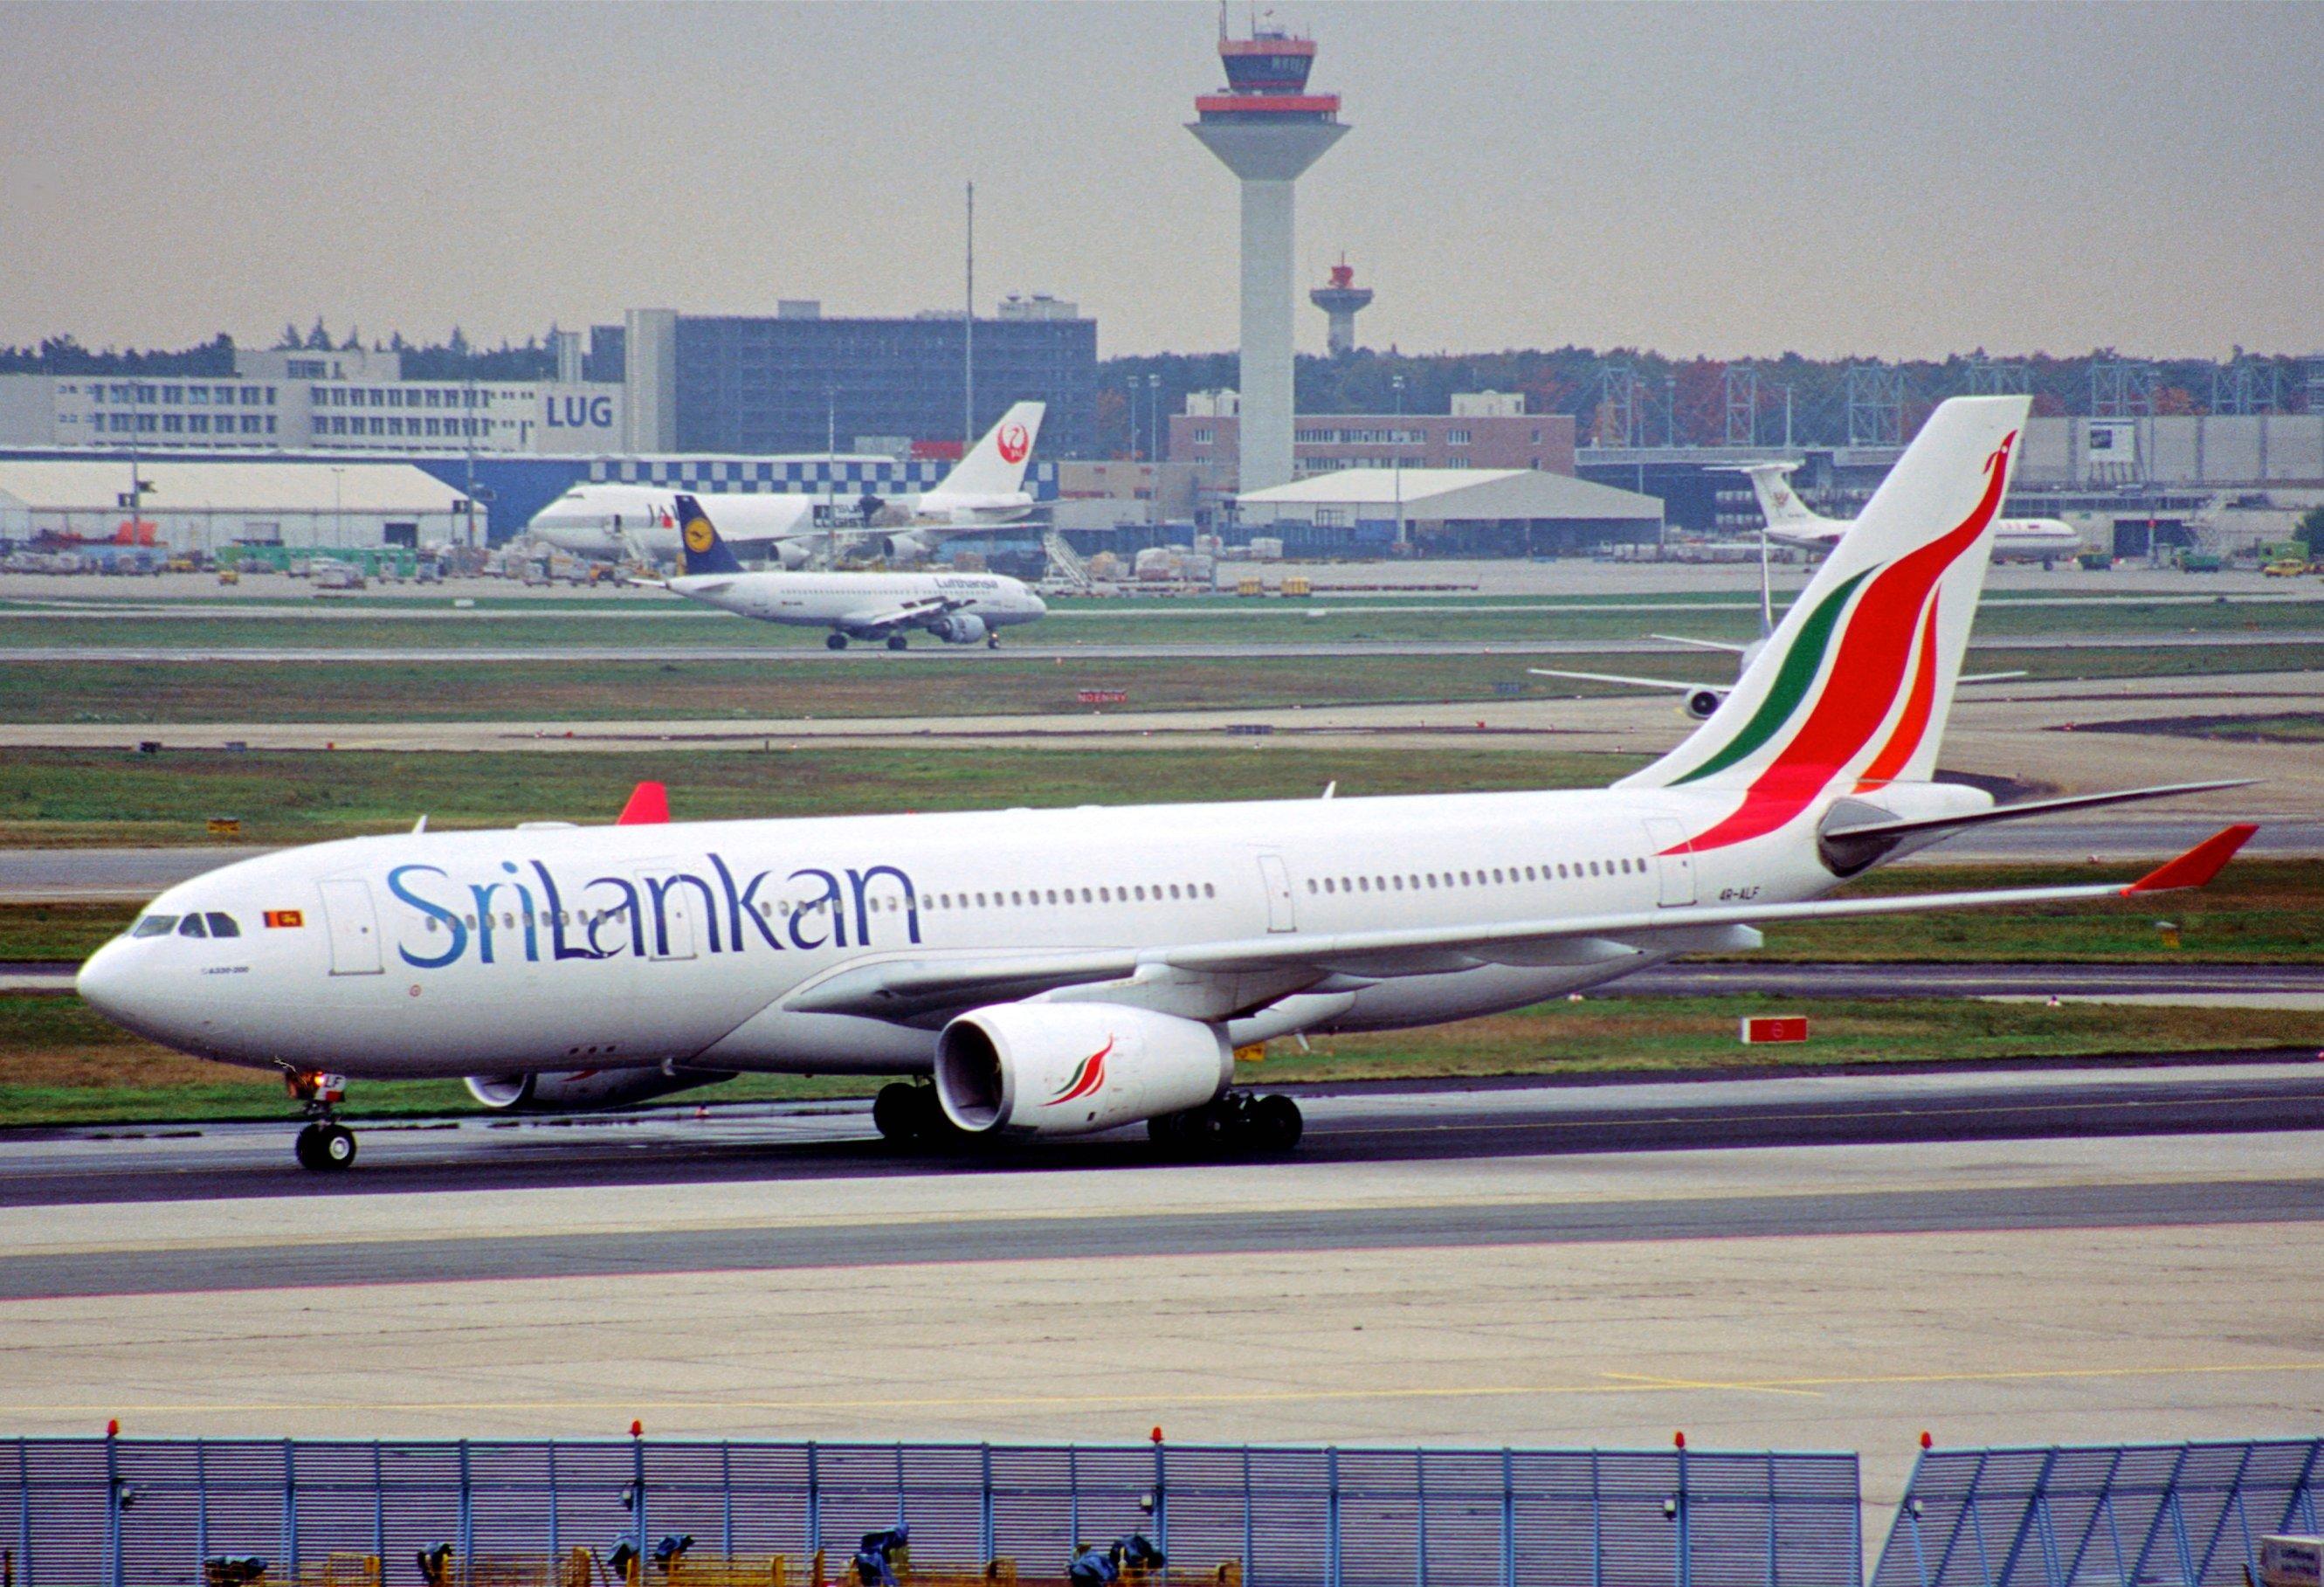 File:113ad - SriLankan Airlines Airbus A330-243, 4R-ALF@FRA,20.10 ...